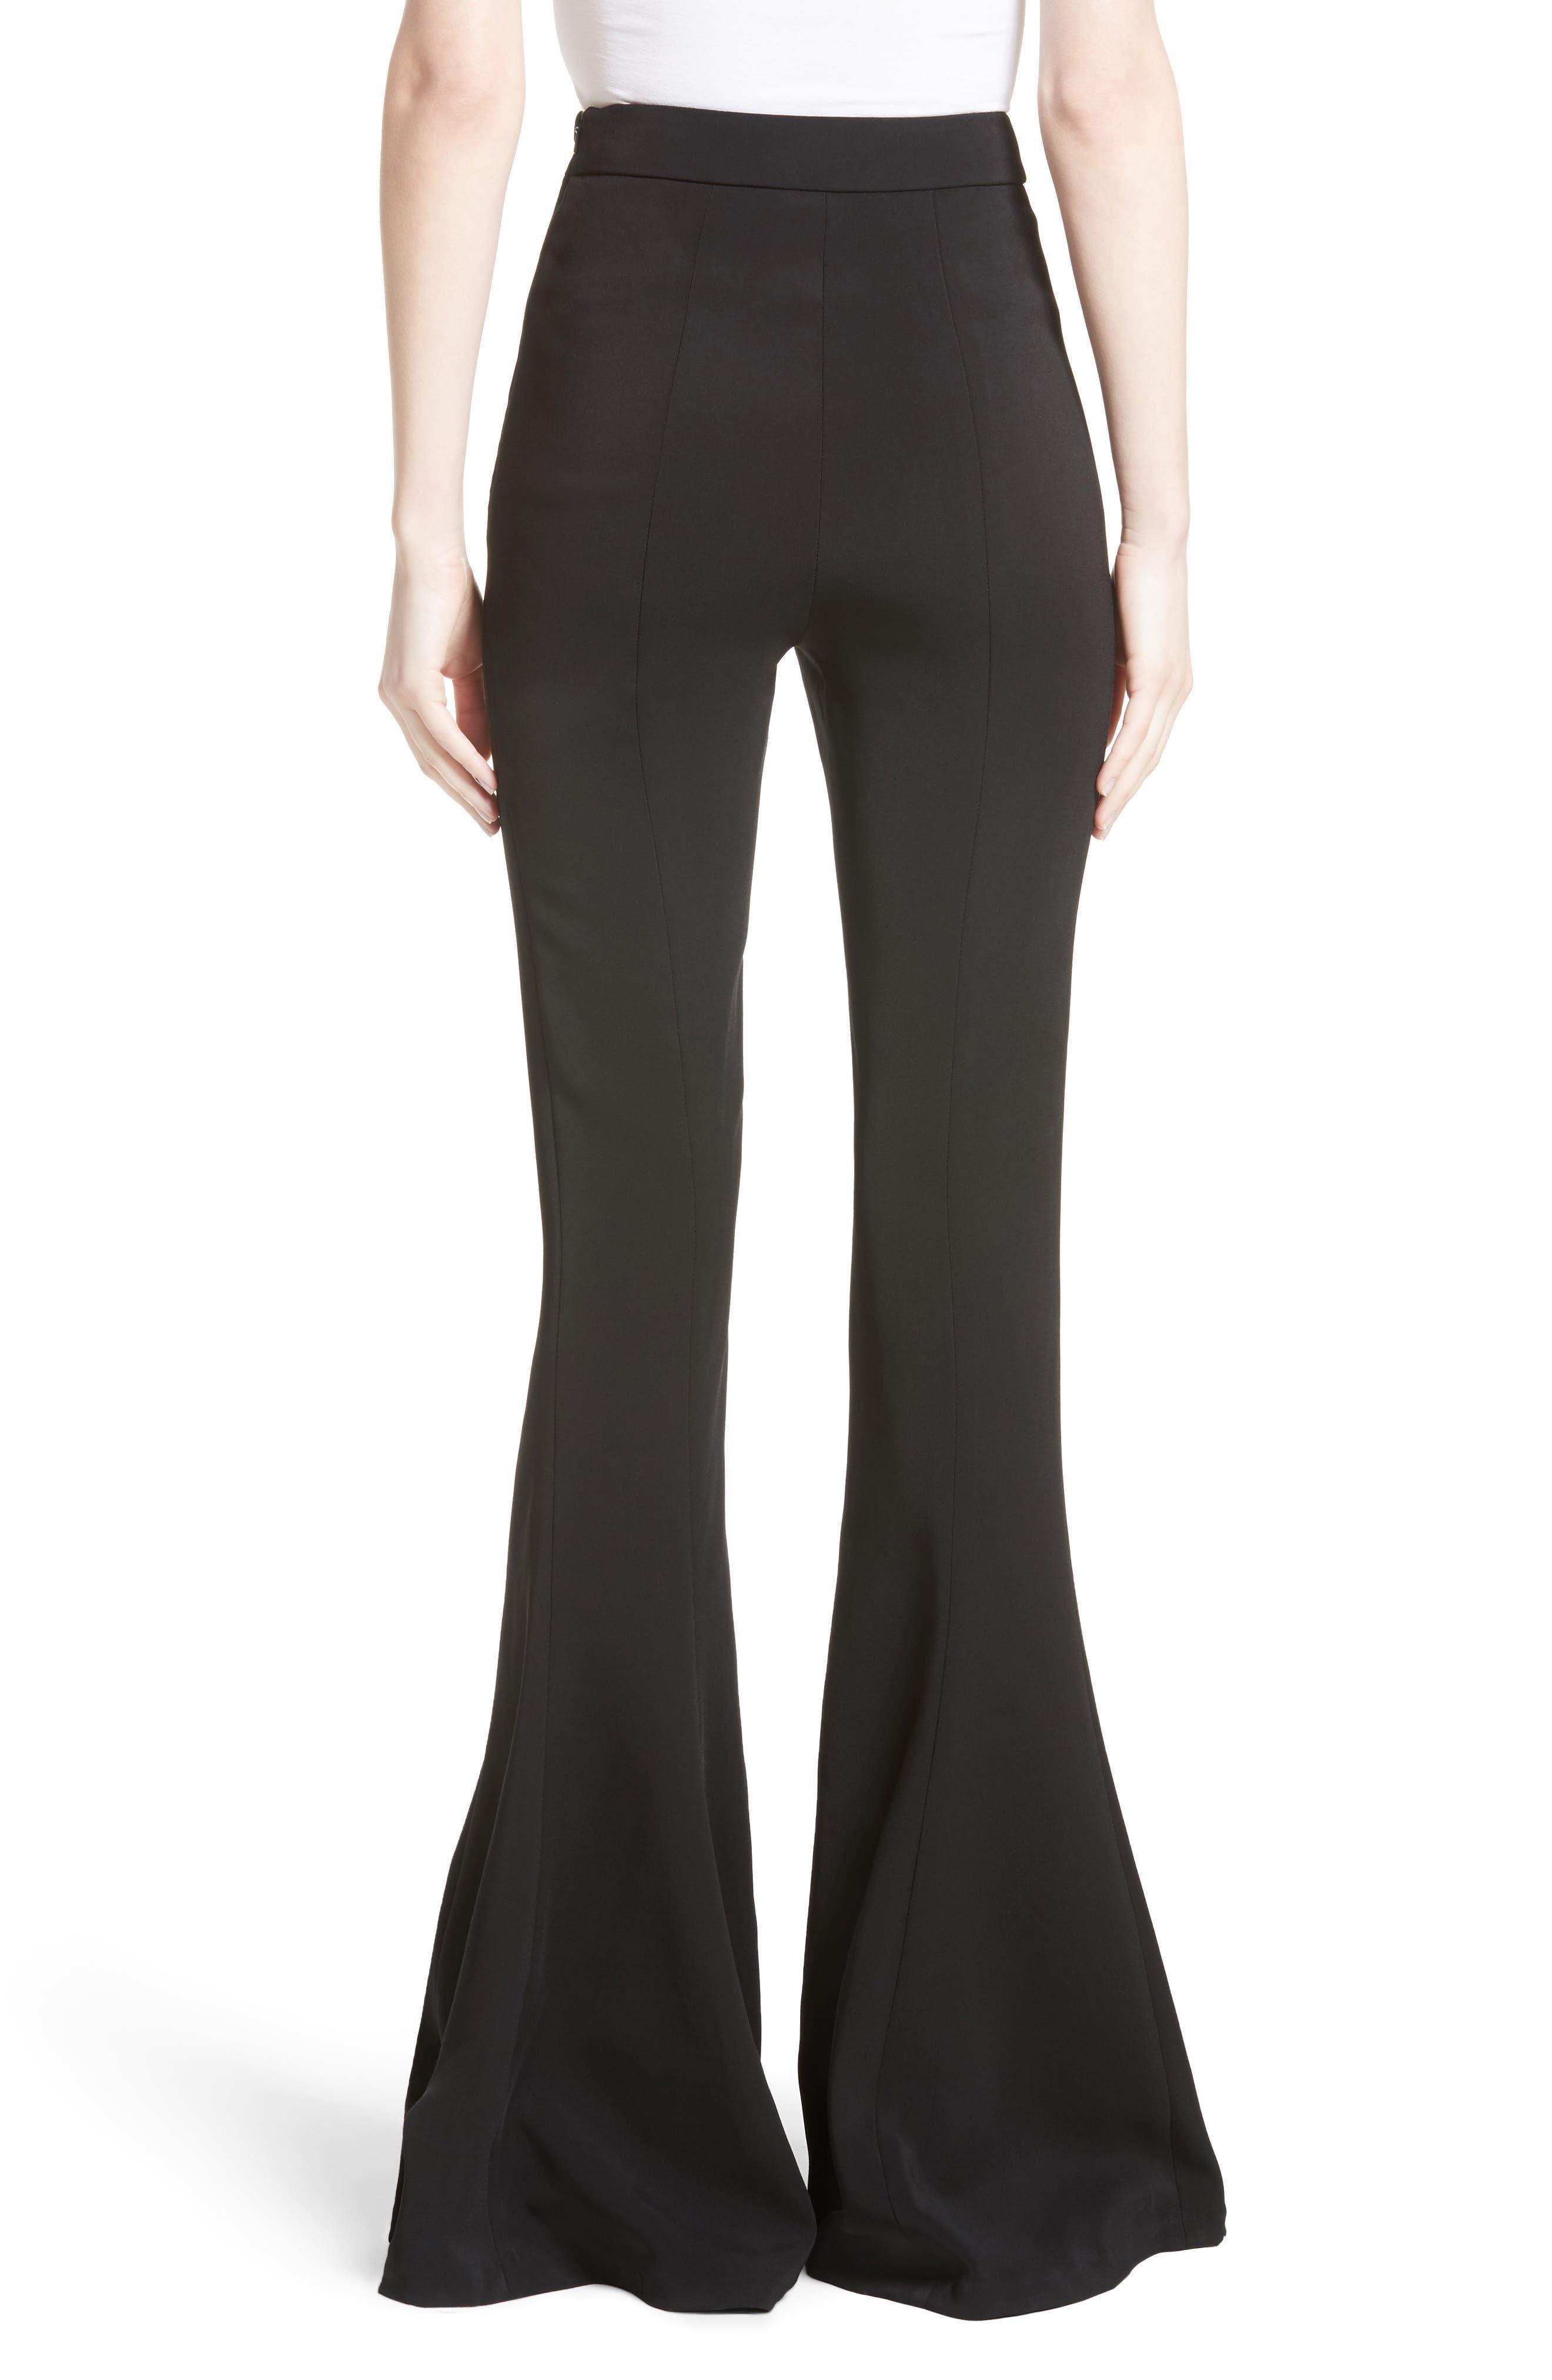 Alternate Image 2  - Cushnie et Ochs Naomi High Waist Flare Pants